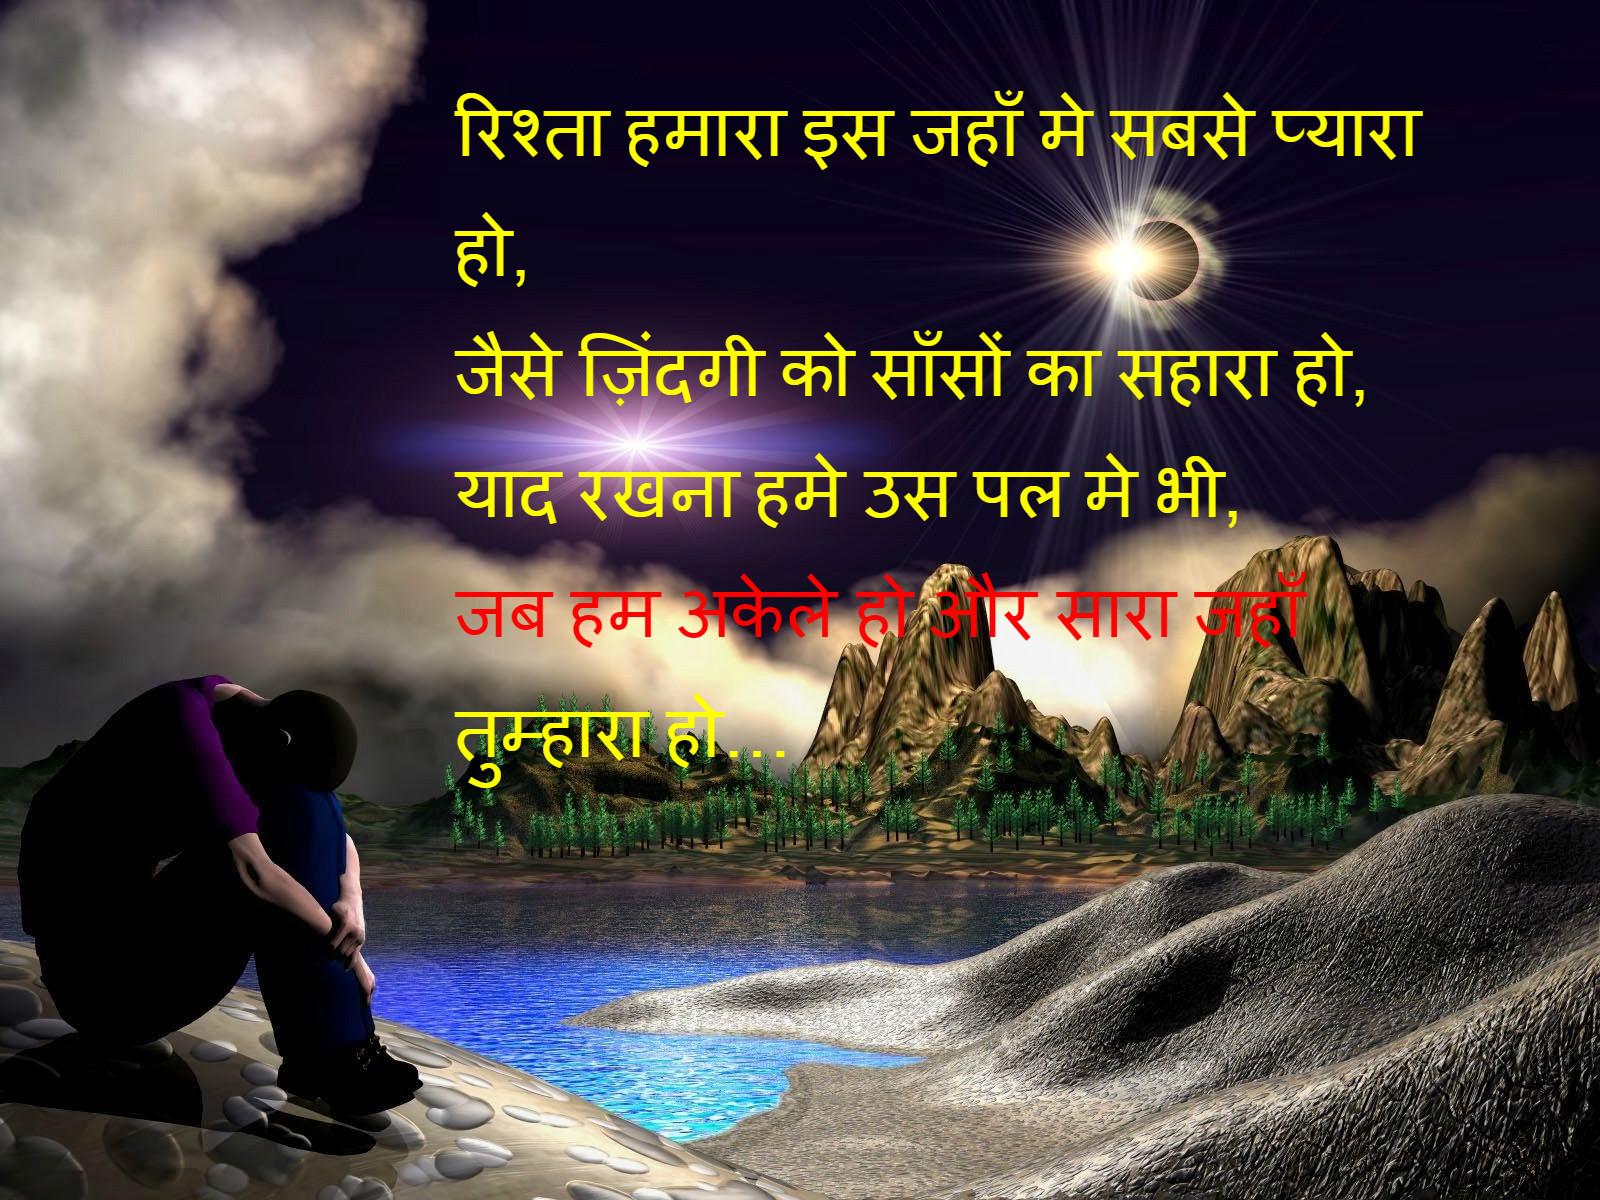 Good Morning Love Shayari : Shayari urdu images with picture